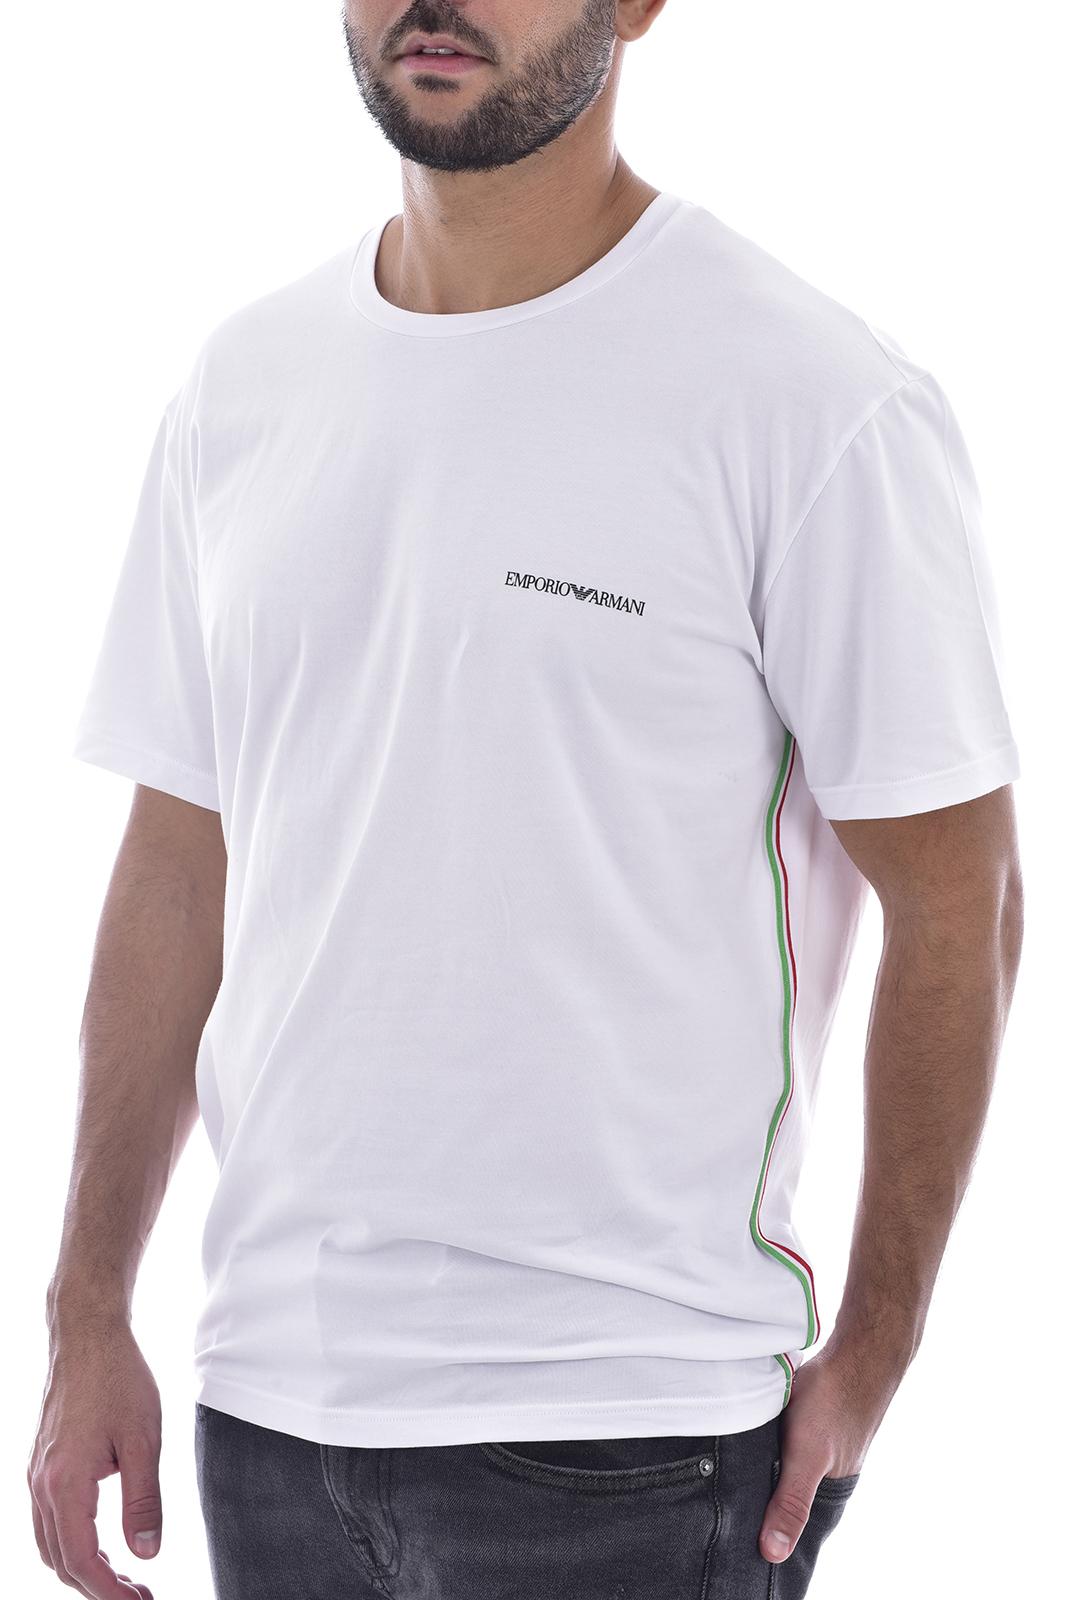 T-S manches courtes  Emporio armani 110853 0A510 010 WHITE